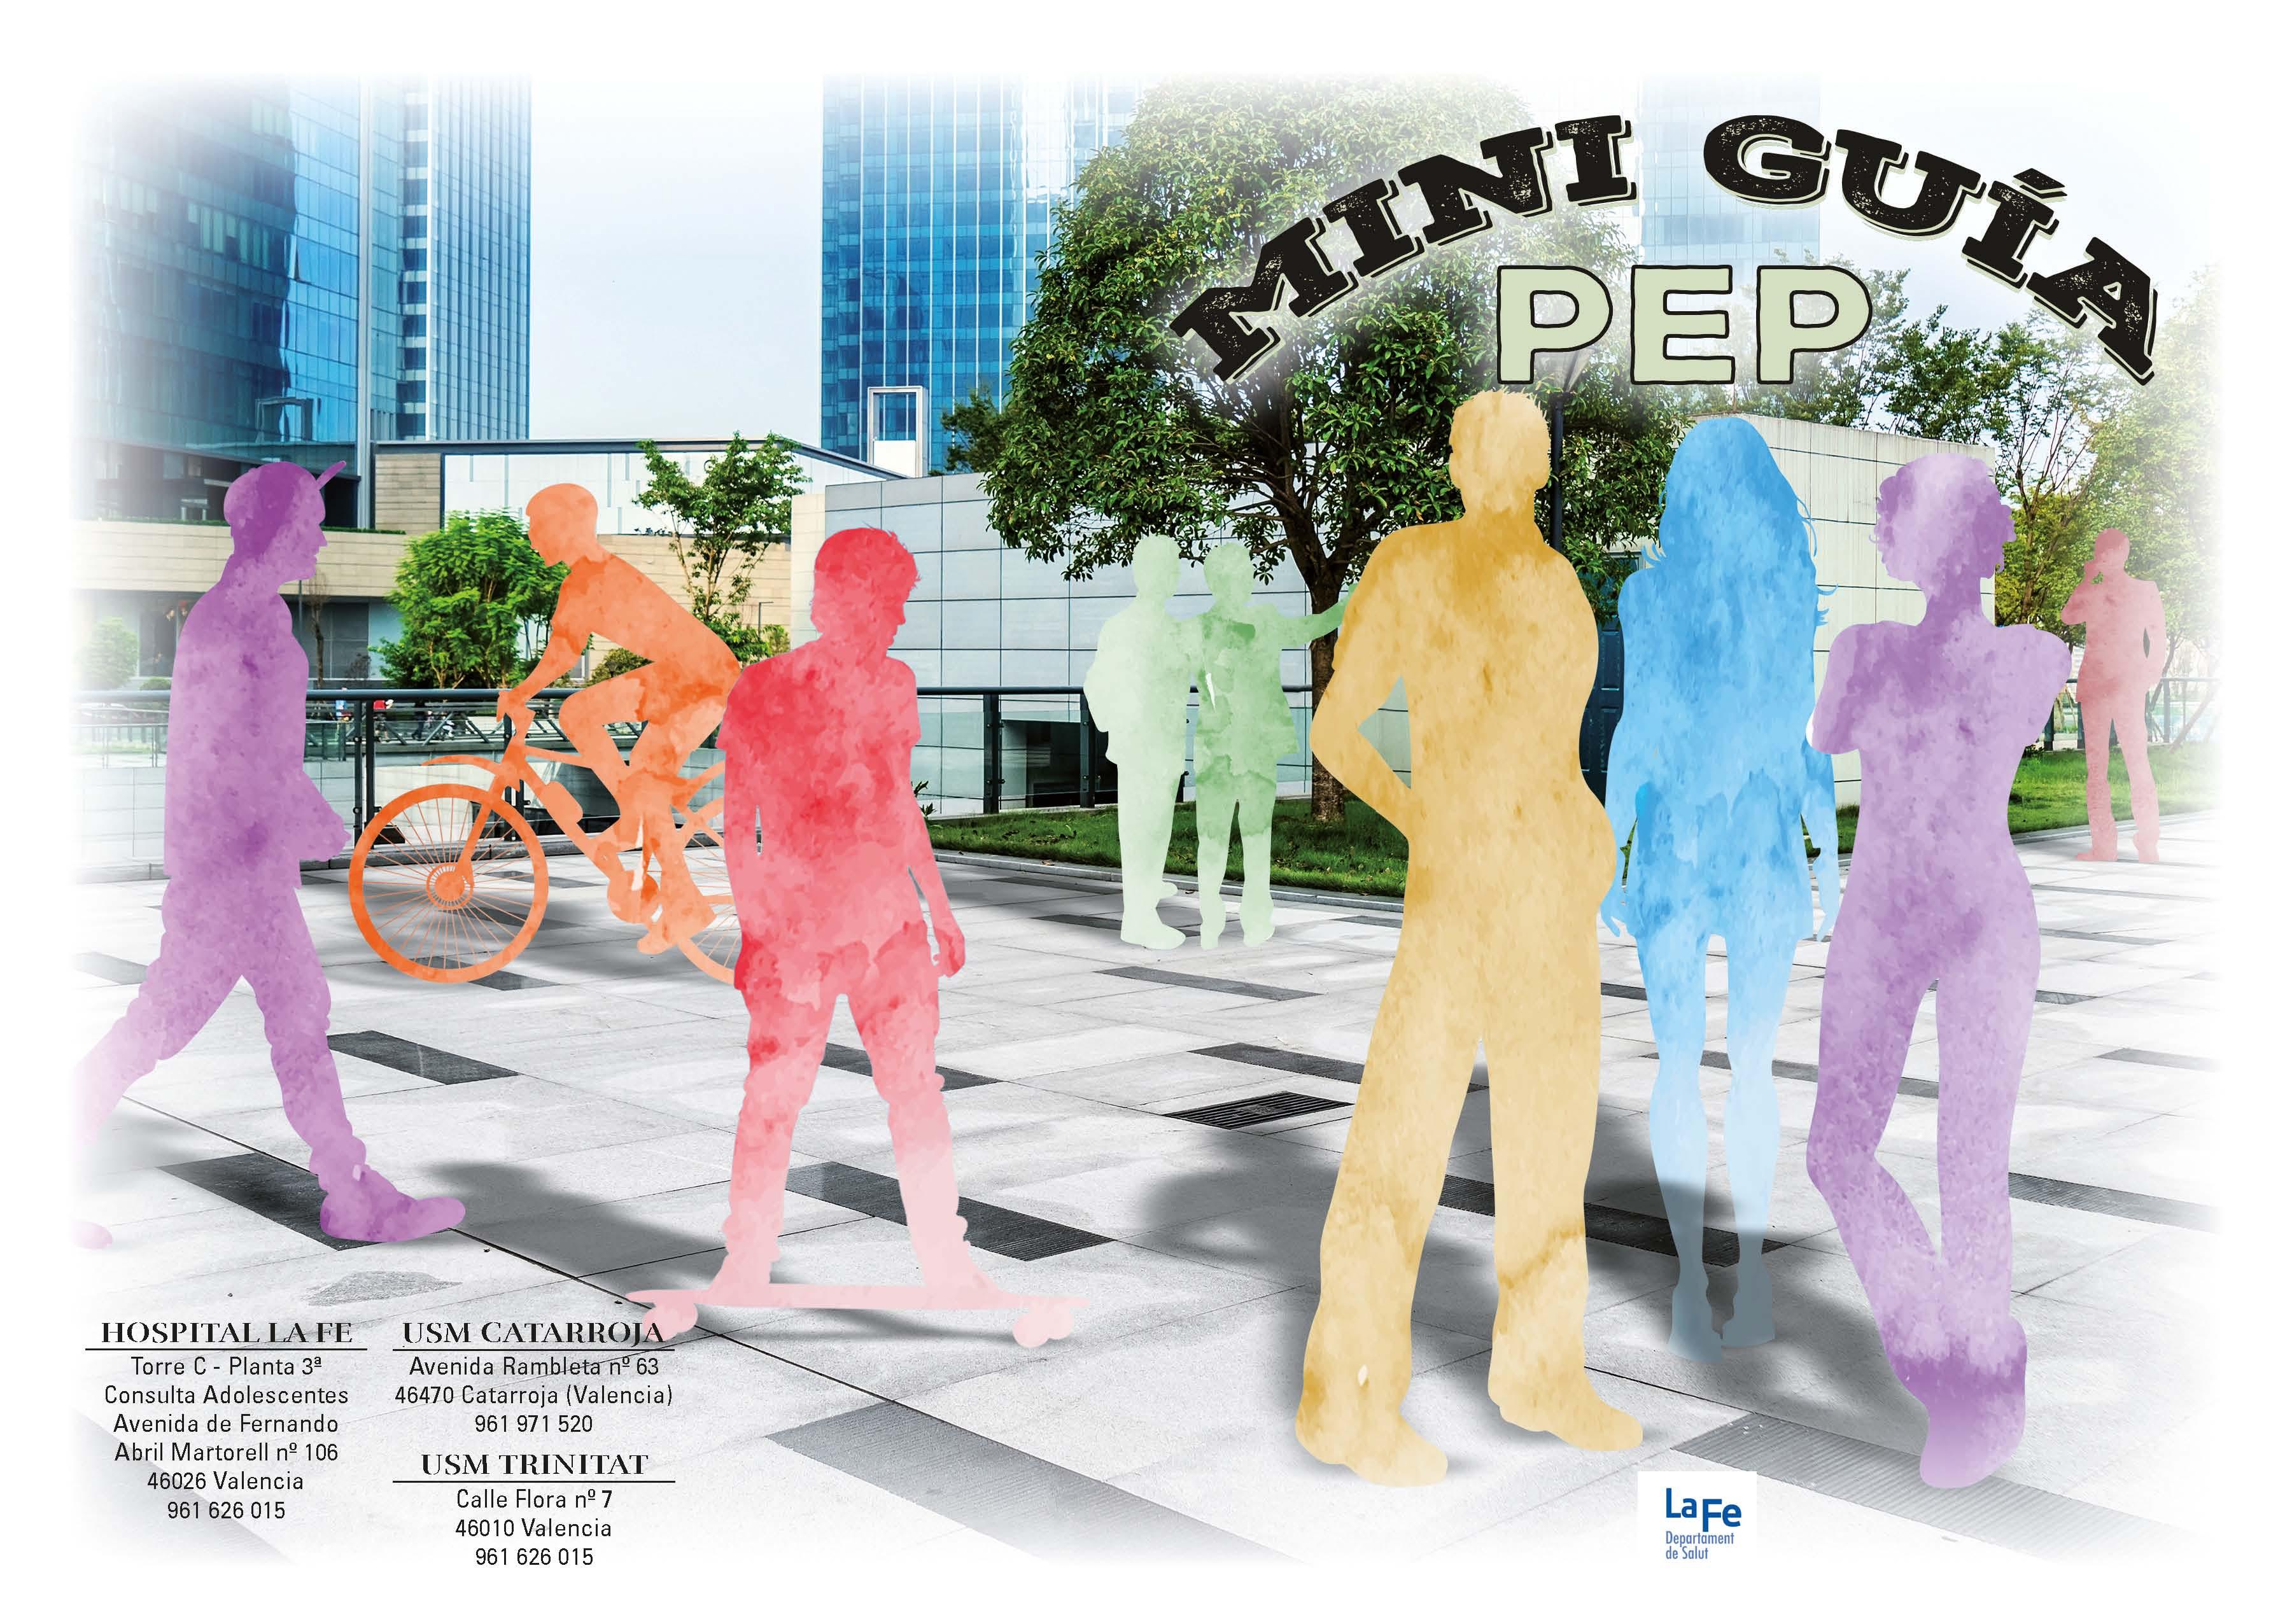 Mini guía PEP